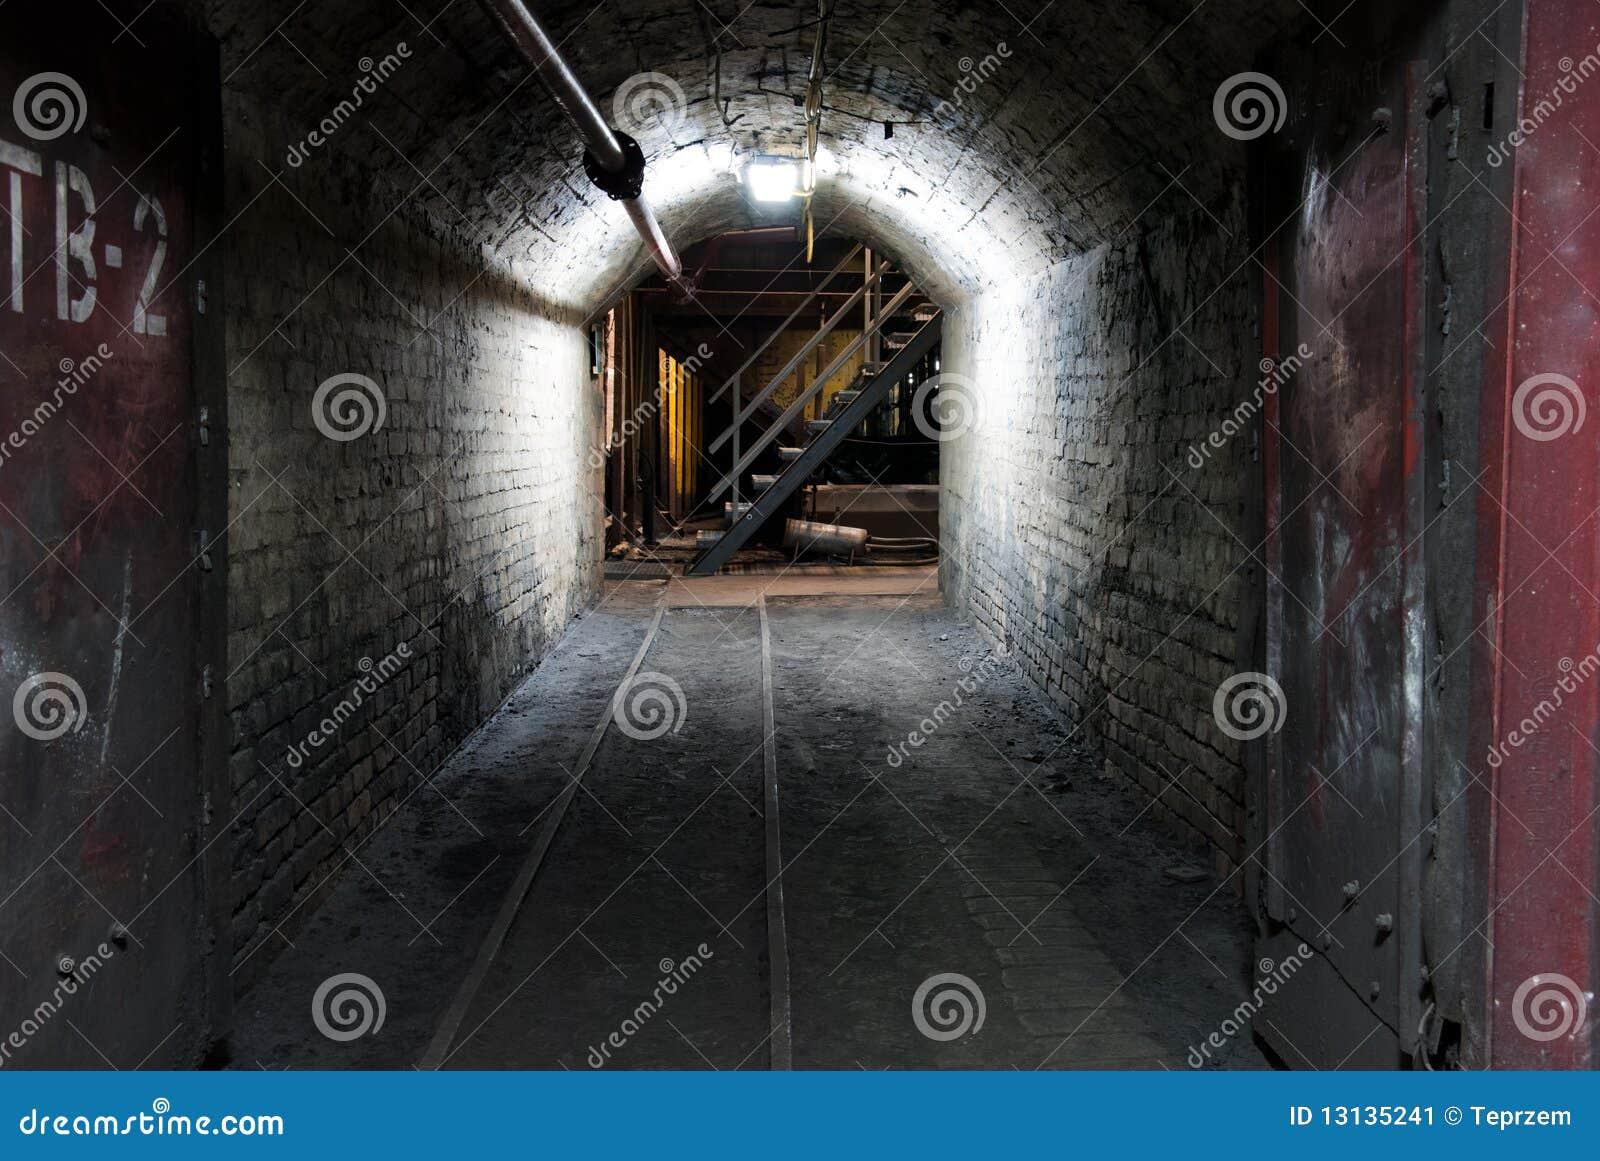 Modern Coal Mine Stock Image - Image: 13135241